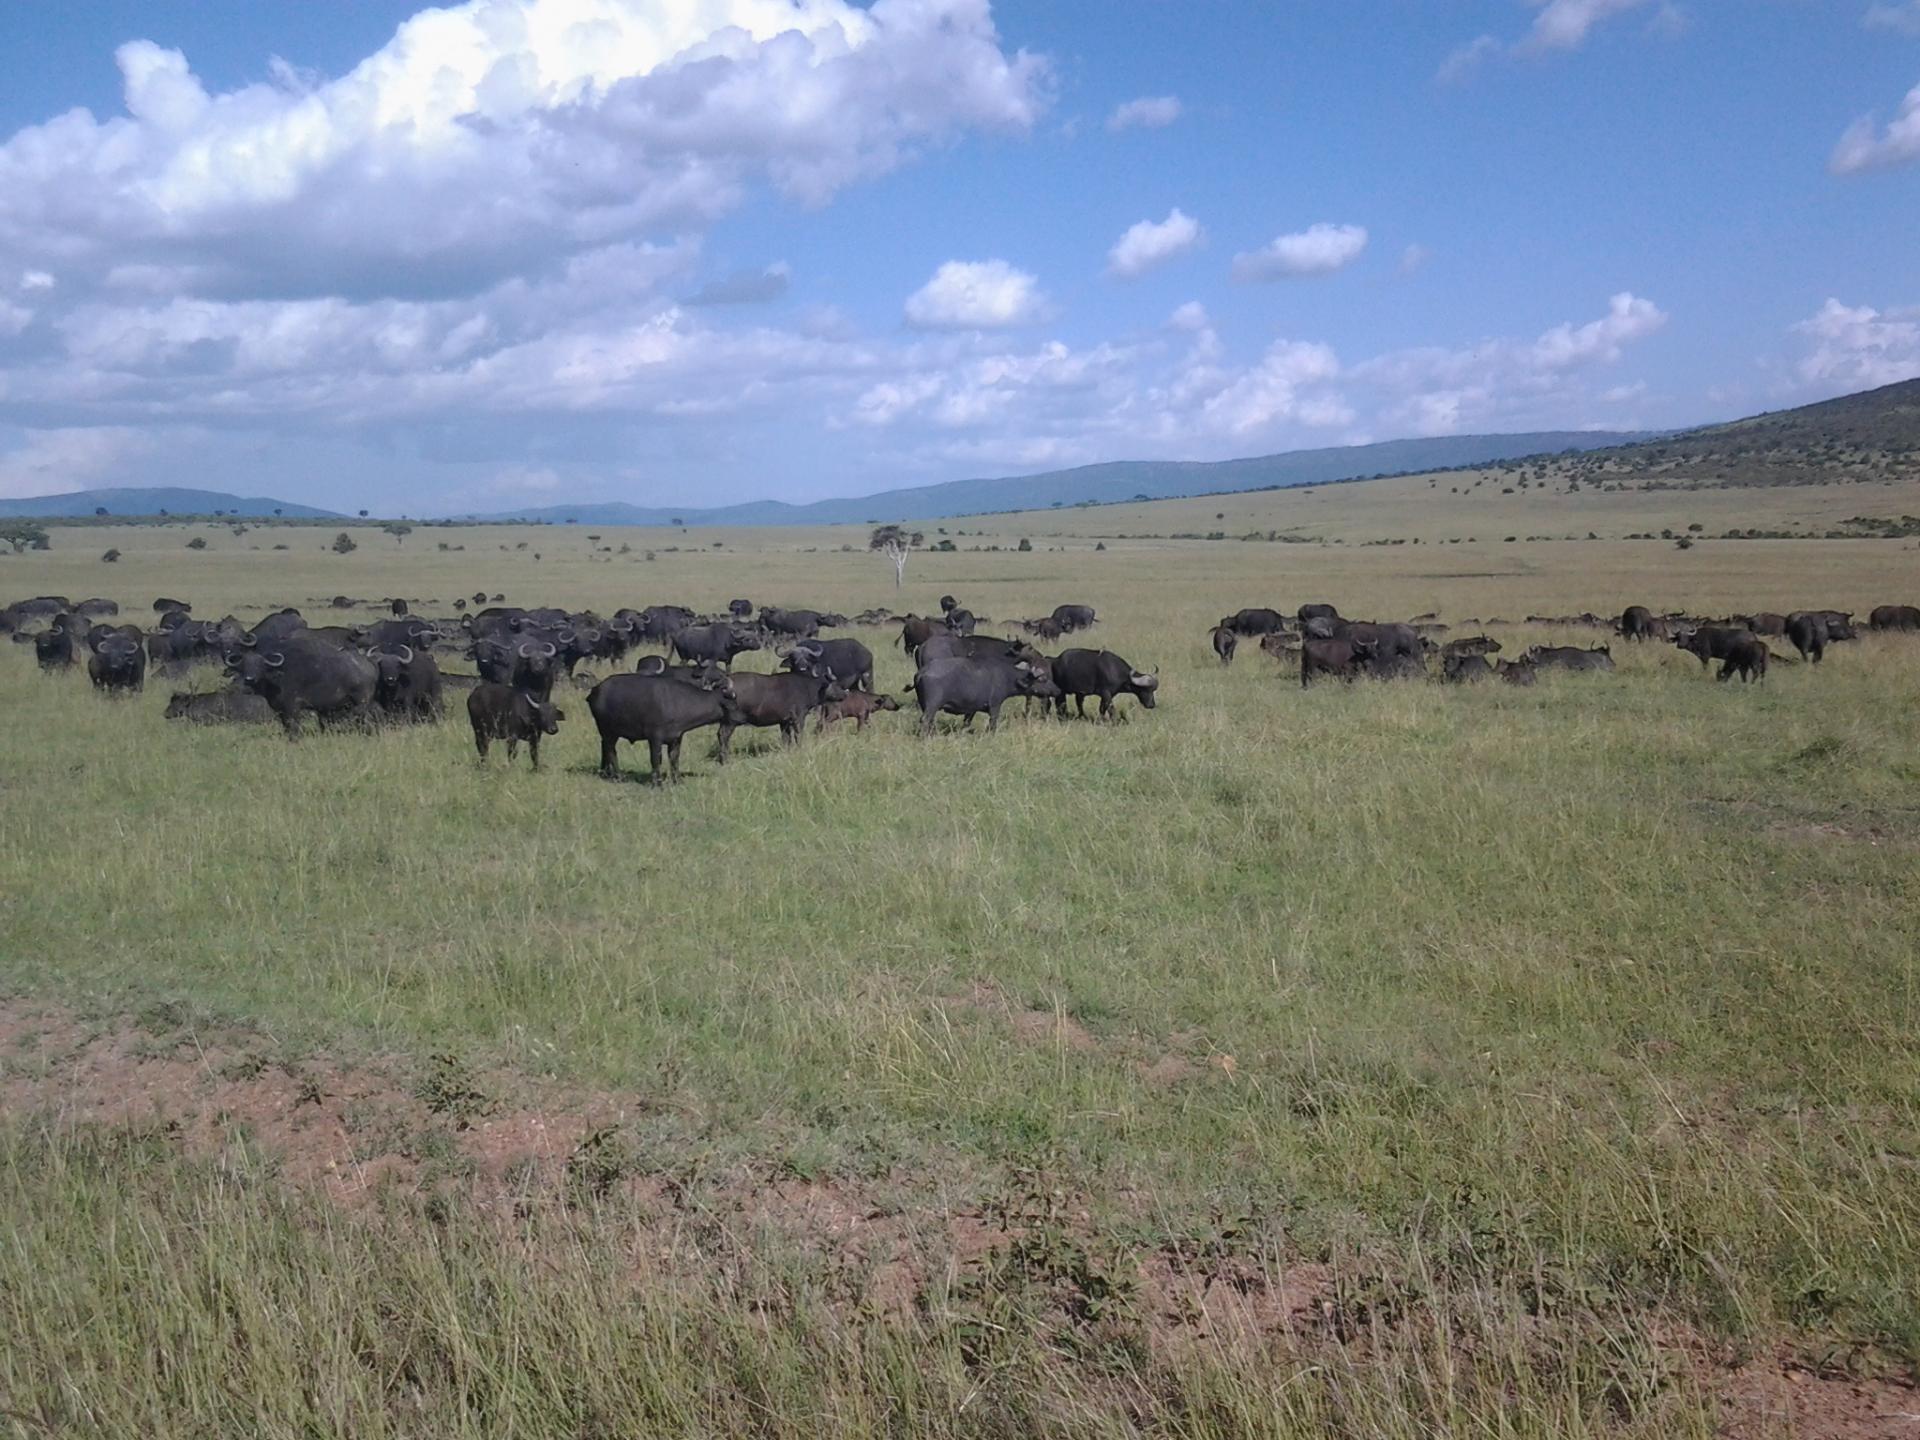 Wildlife Safari /Kenya Adventure Safaris/Holidays in Masai Mara